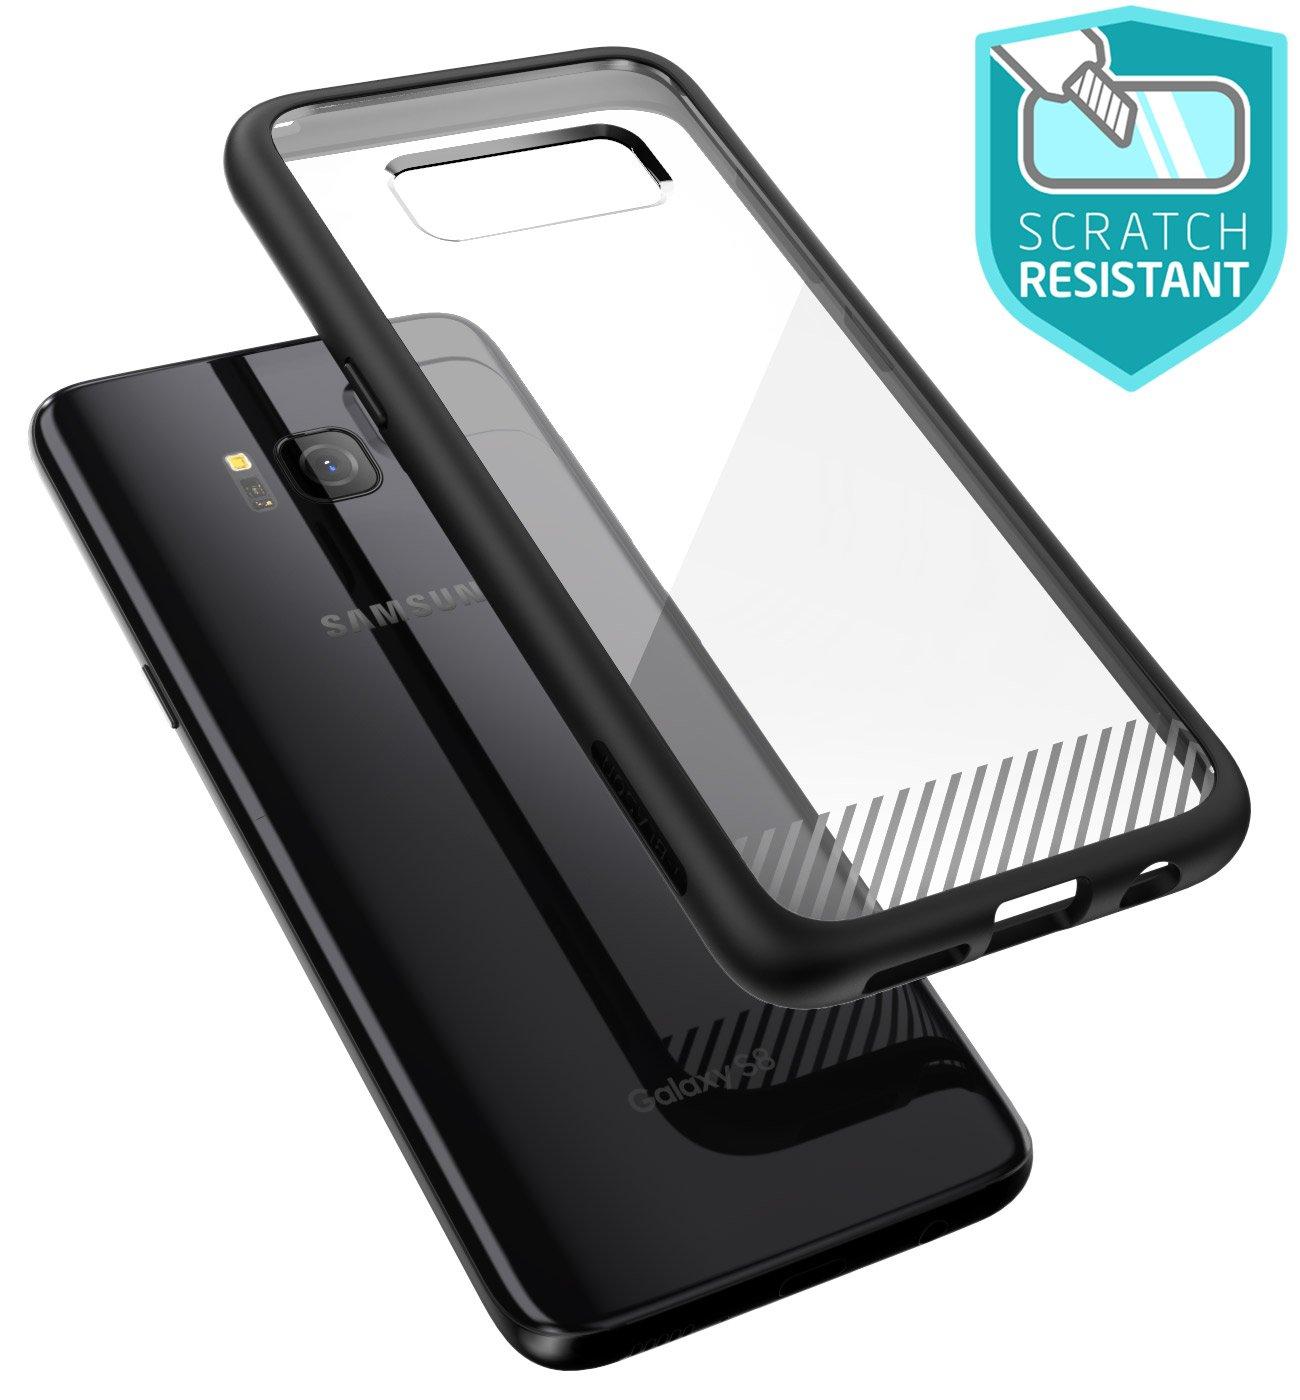 Scratch Resistant i Blason Samsung Release Image 3